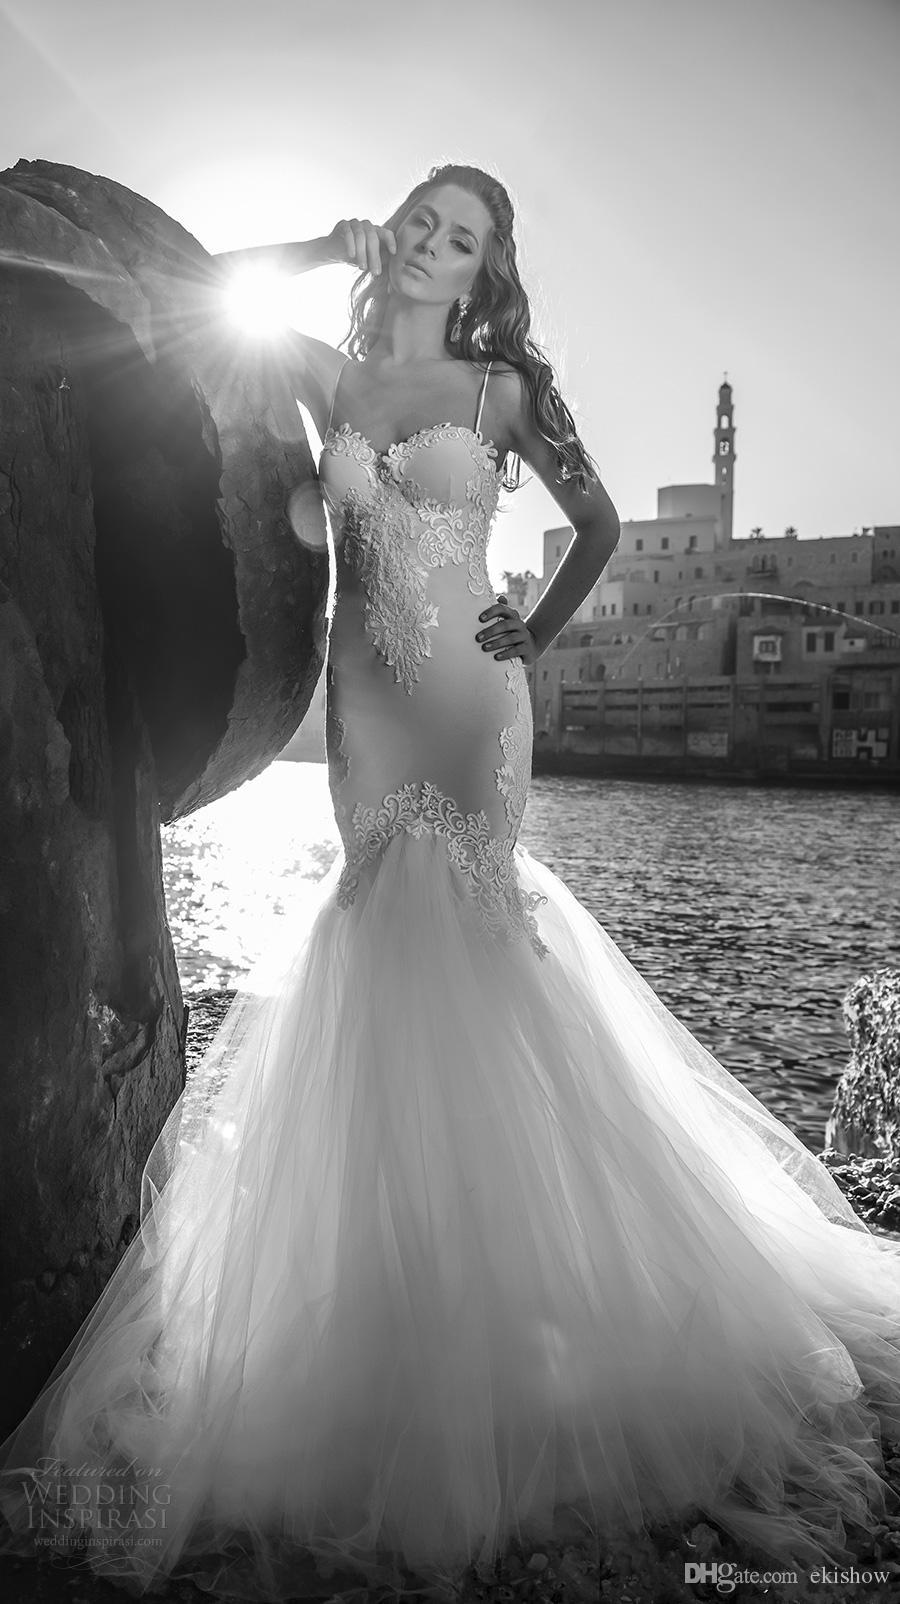 Vestidos De Noiva 2017 Marfil Blanco Impresionante Julie Vino Sirena Vestidos de novia Sexy Correas de espagueti Sin respaldo Playa Vestido de novia